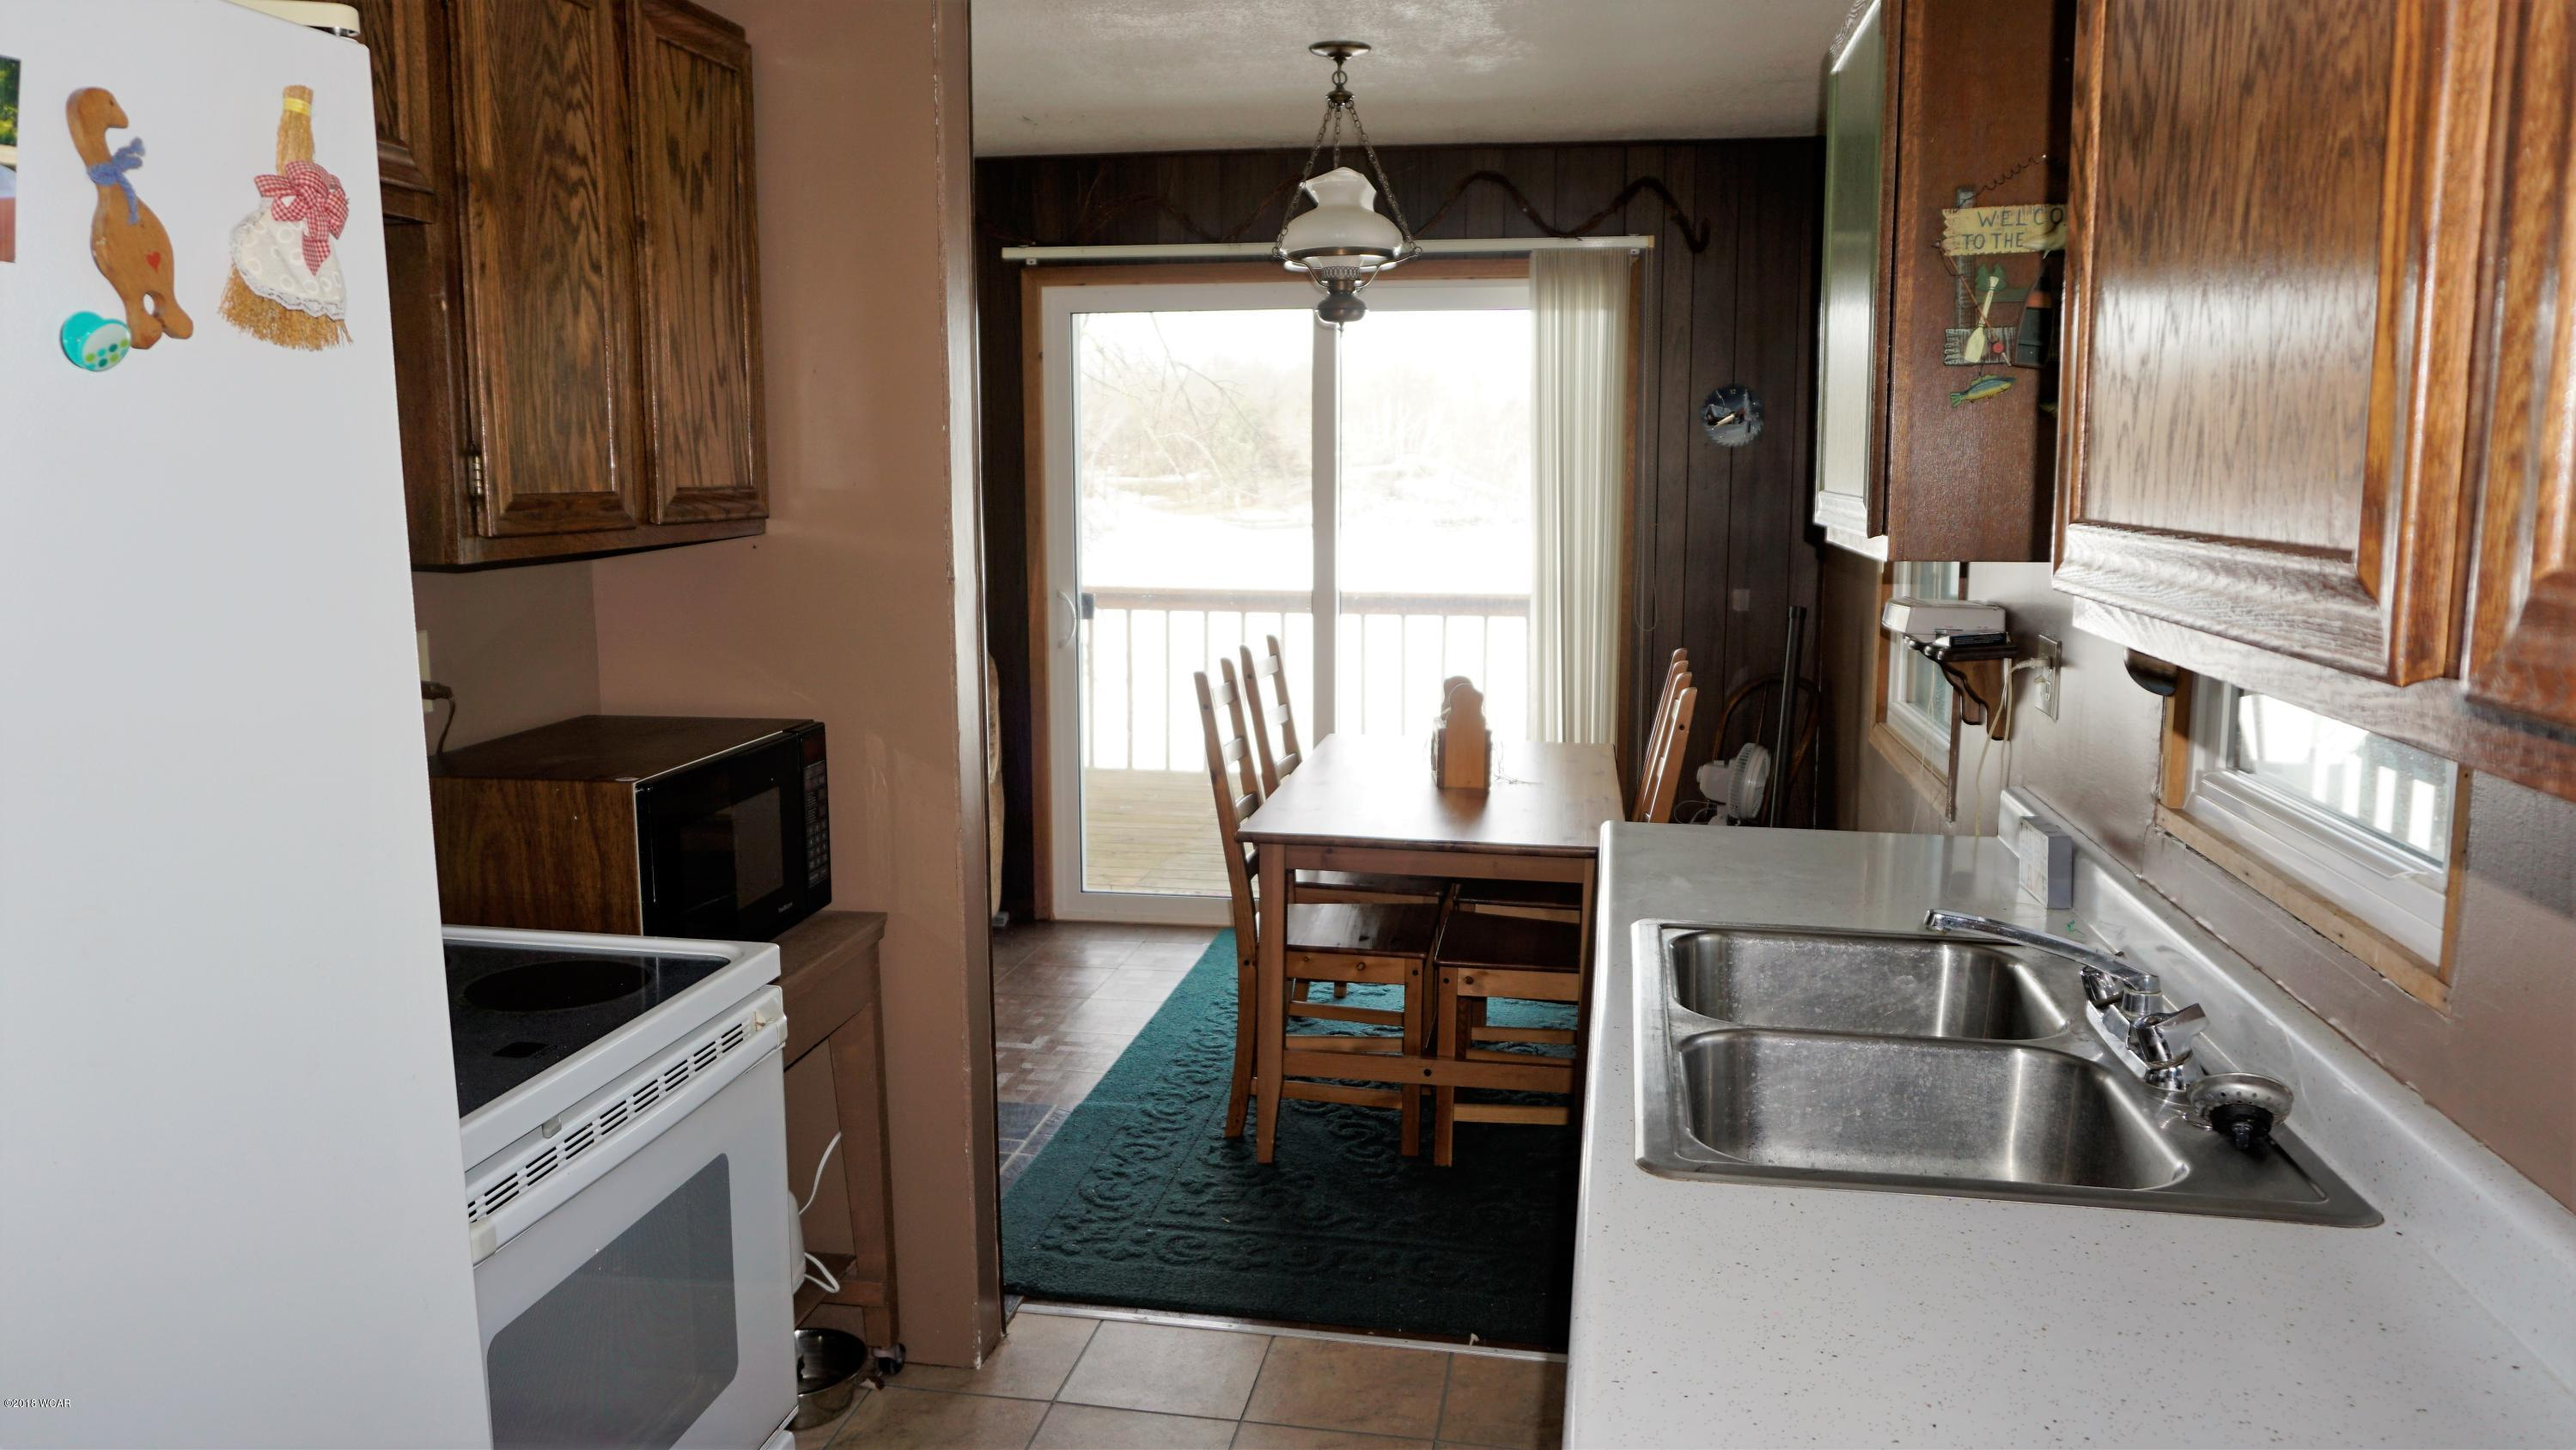 20873 Elmdale Road,Richmond,2 Bedrooms Bedrooms,2 BathroomsBathrooms,Single Family,Elmdale Road,6032393